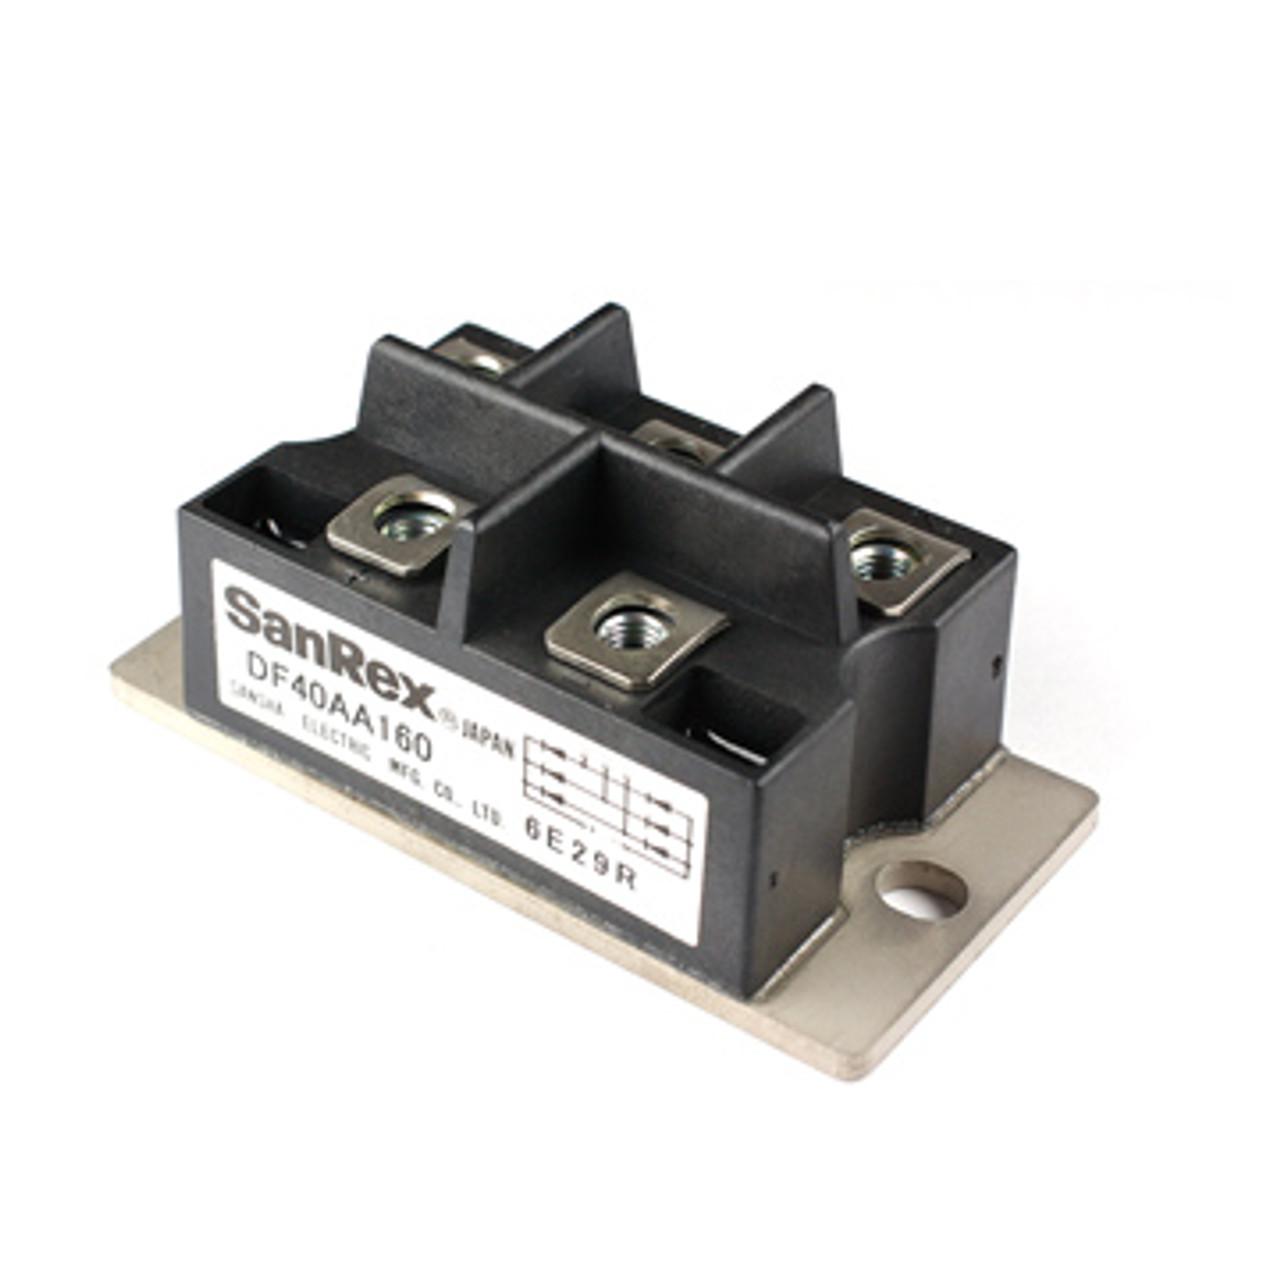 SanRex DF40AA160 Bridge Rectifier Module